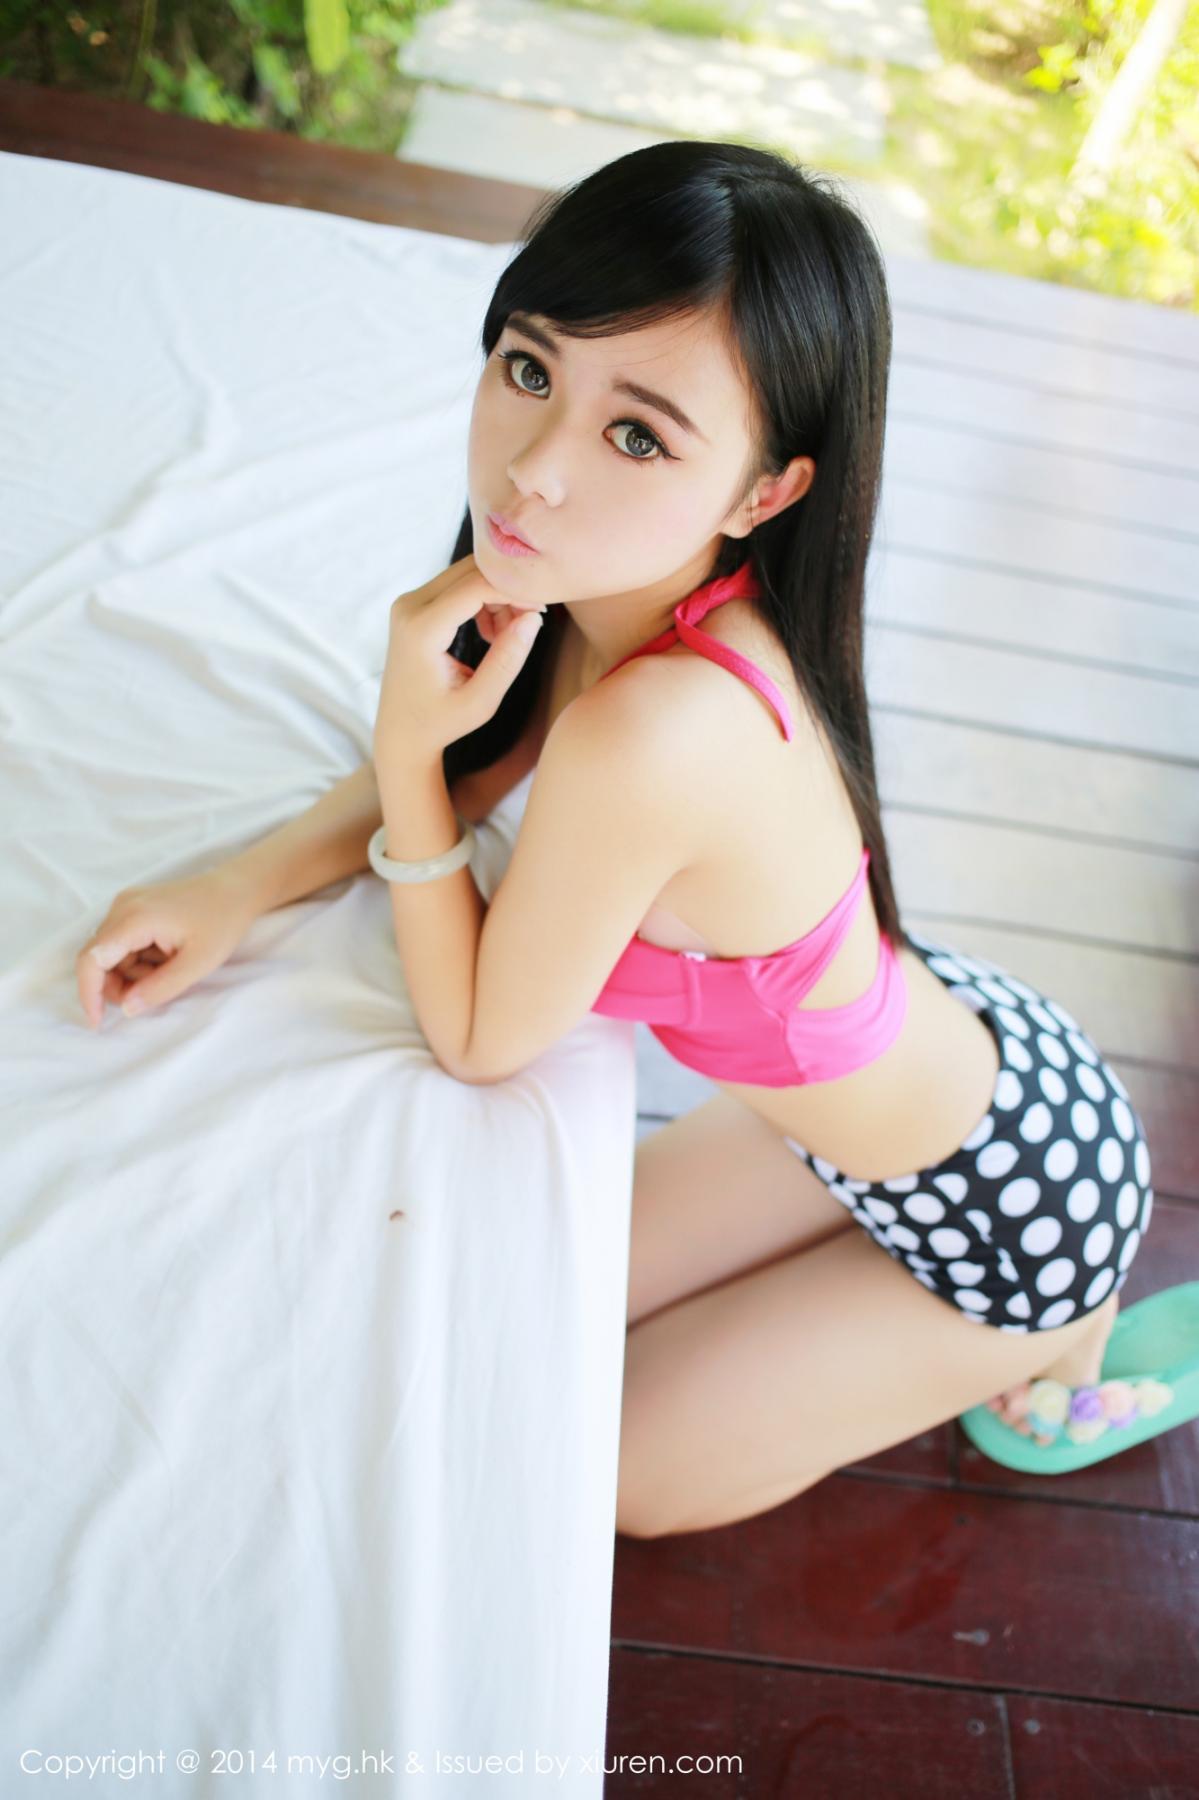 [MyGirl] Vol.012 Yu Zhu 74P, Lovely, Pure, Yu Zhu